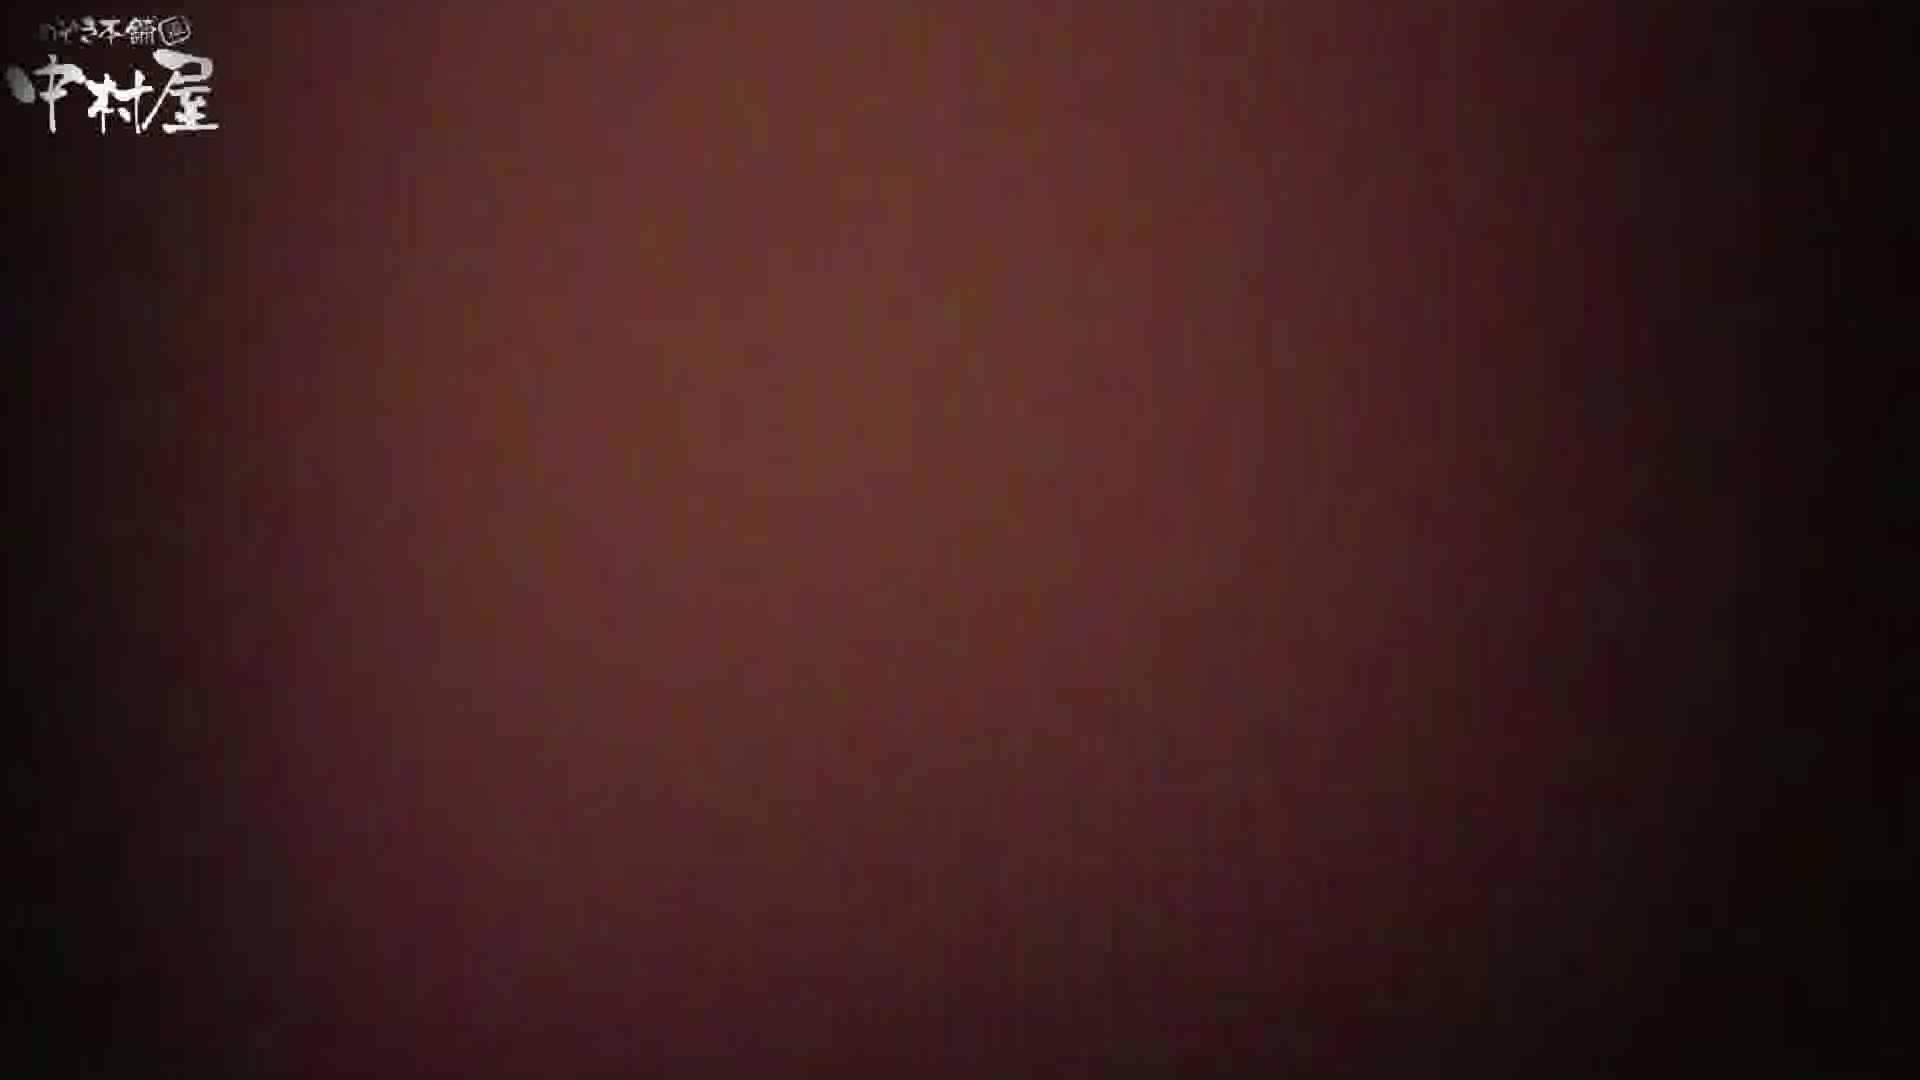 民家風呂専門盗撮師の超危険映像 vol.012 美少女ヌード セックス無修正動画無料 70画像 47